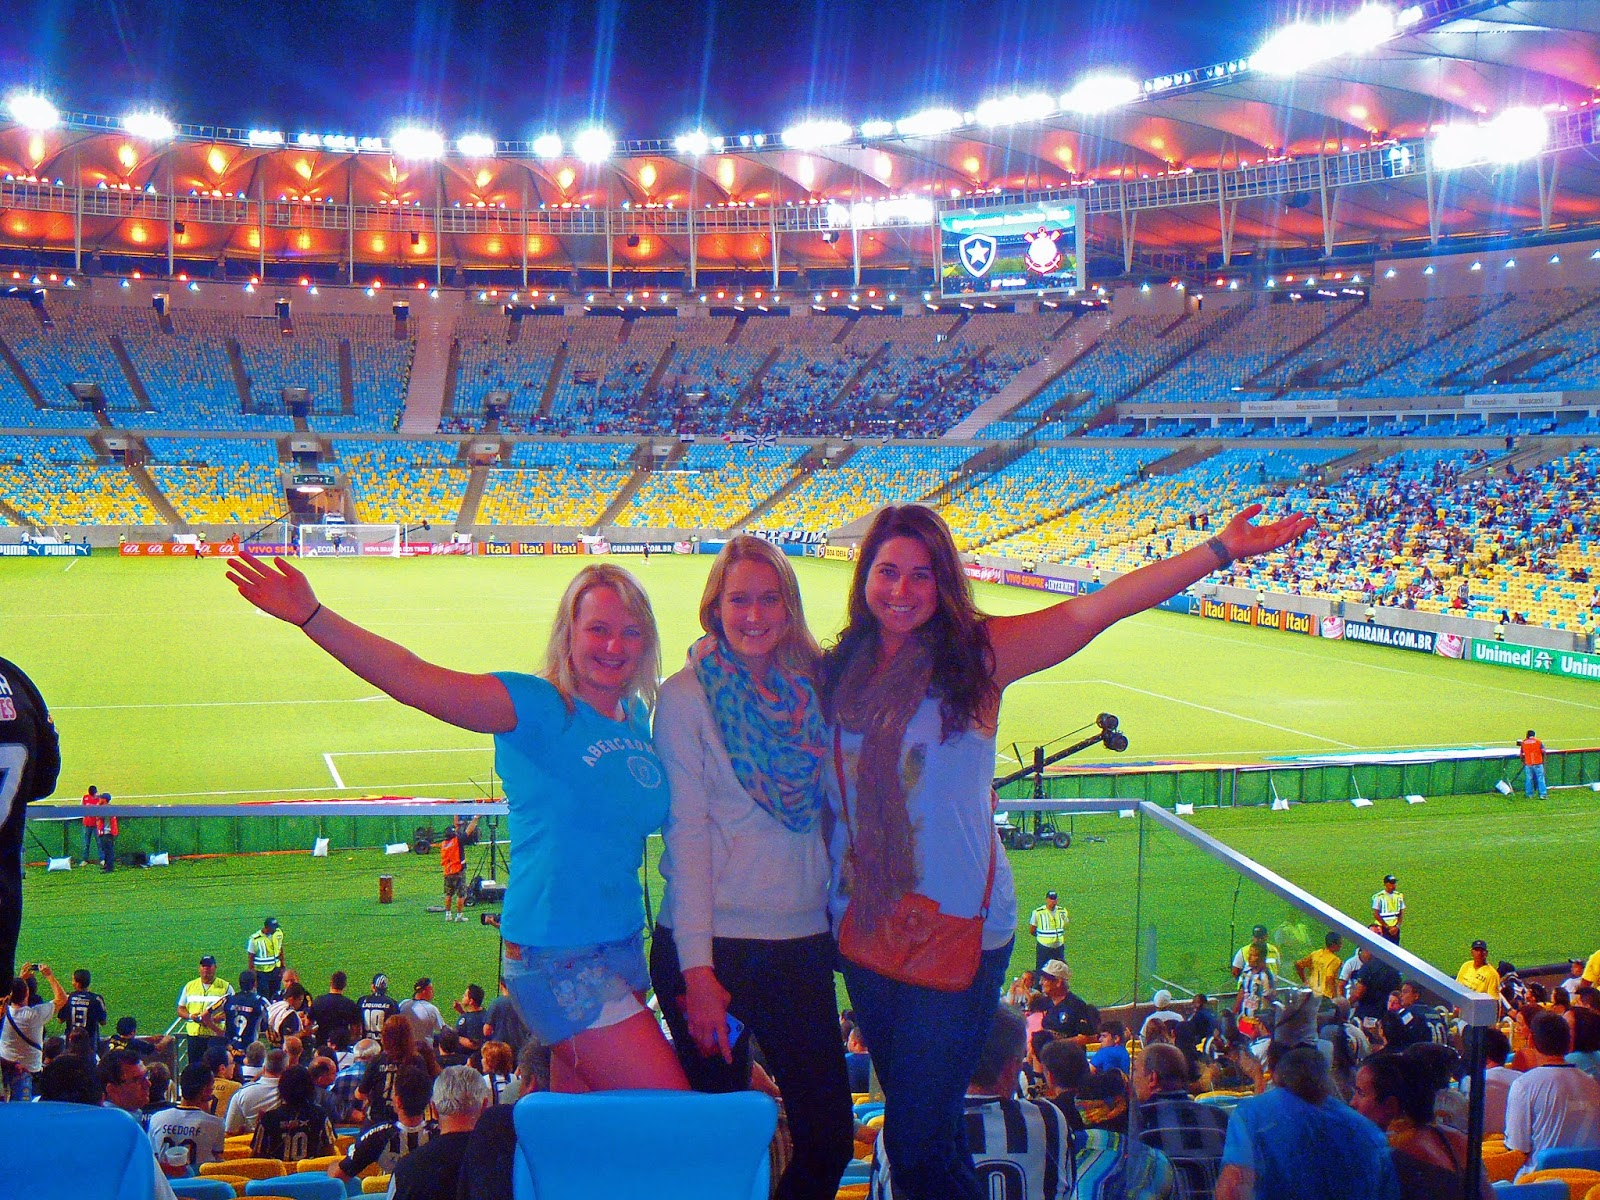 Girls at Maracana Stadium in Rio de Janeiro